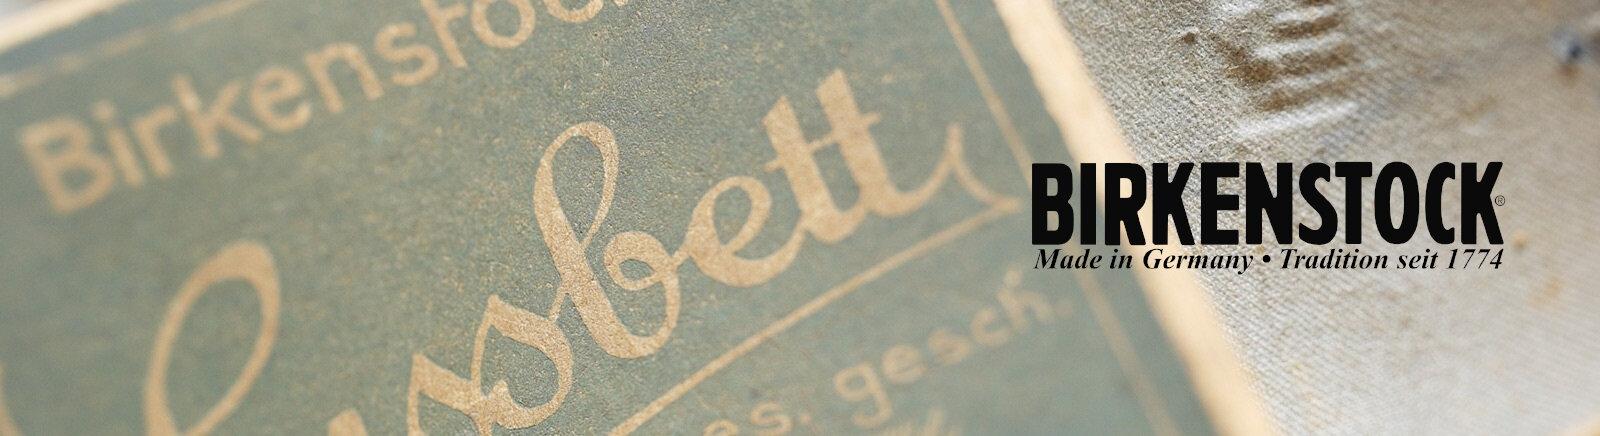 Gisy: Birkenstock Damenschuhe online shoppen